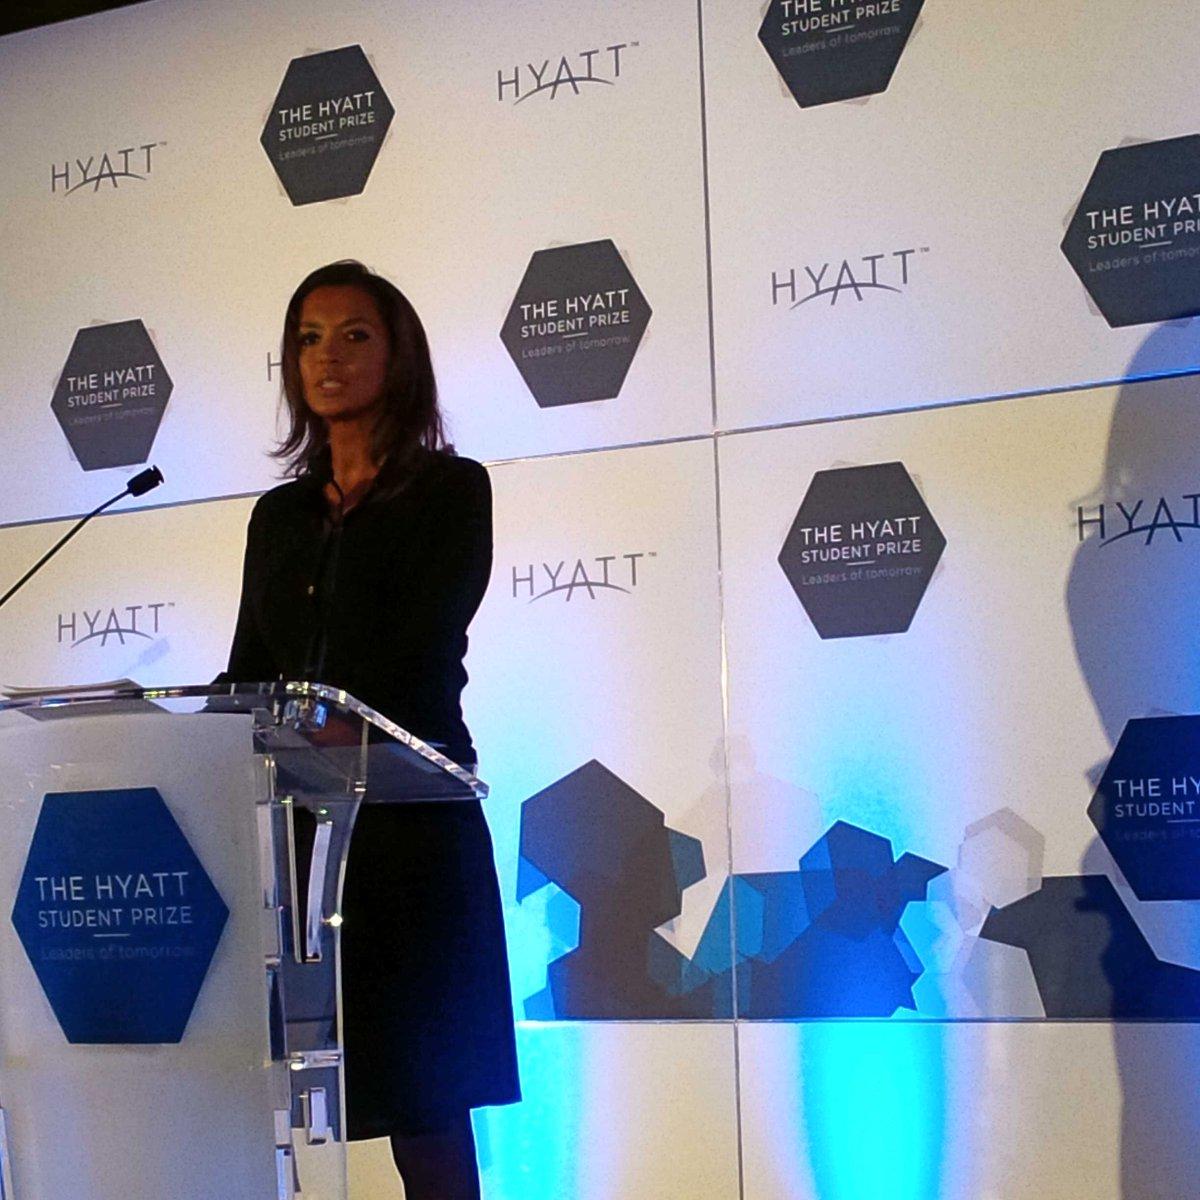 TV host #KarineLeMarchand introducing the #HyattStudentPrize @ParkHyattParis #Vendome #luxury #travel #news<br>http://pic.twitter.com/KXTGRYVr0o